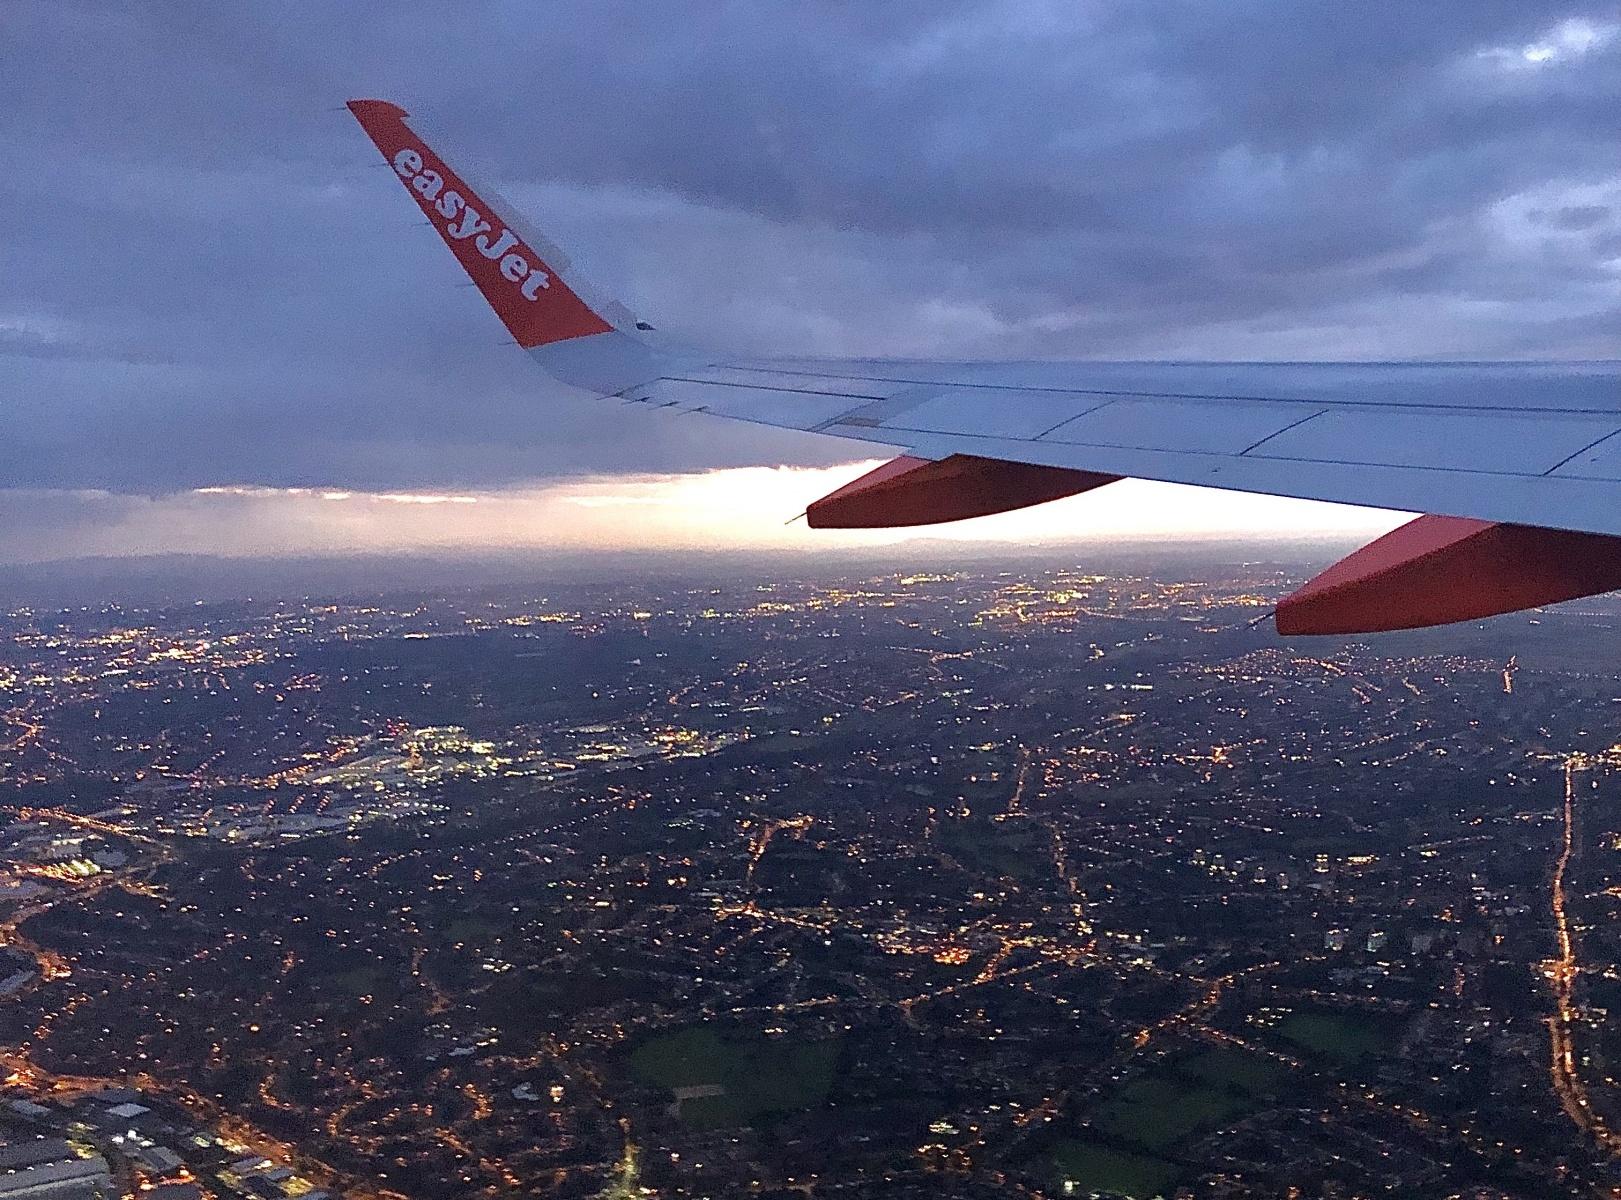 Birmingham from the sky